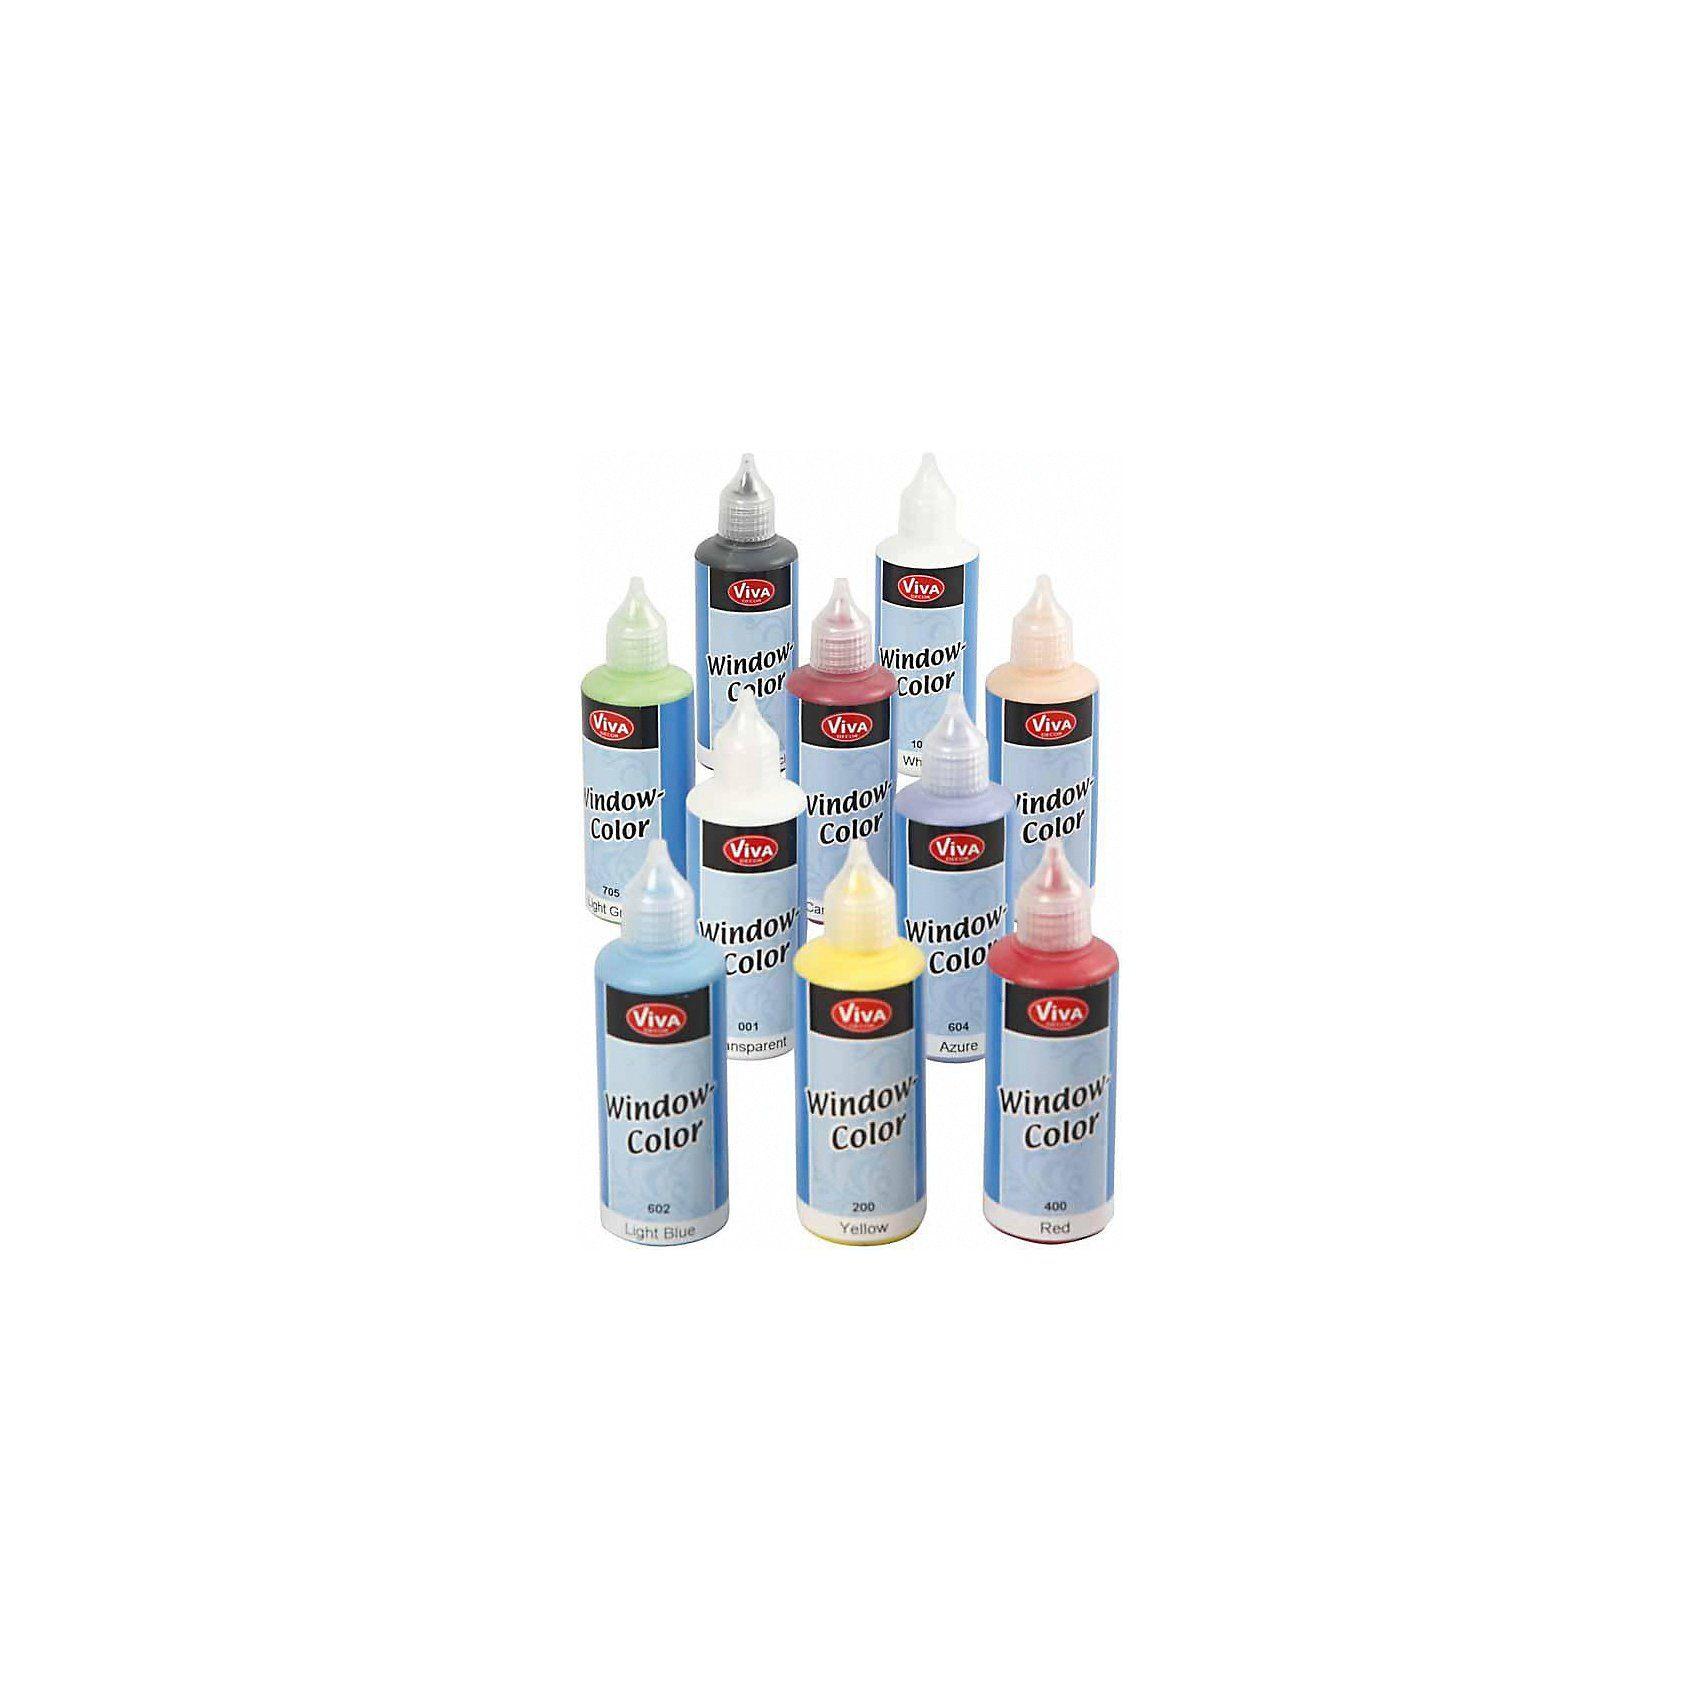 Window Color - Sortiment, 10x80 ml, Sortierte Farben